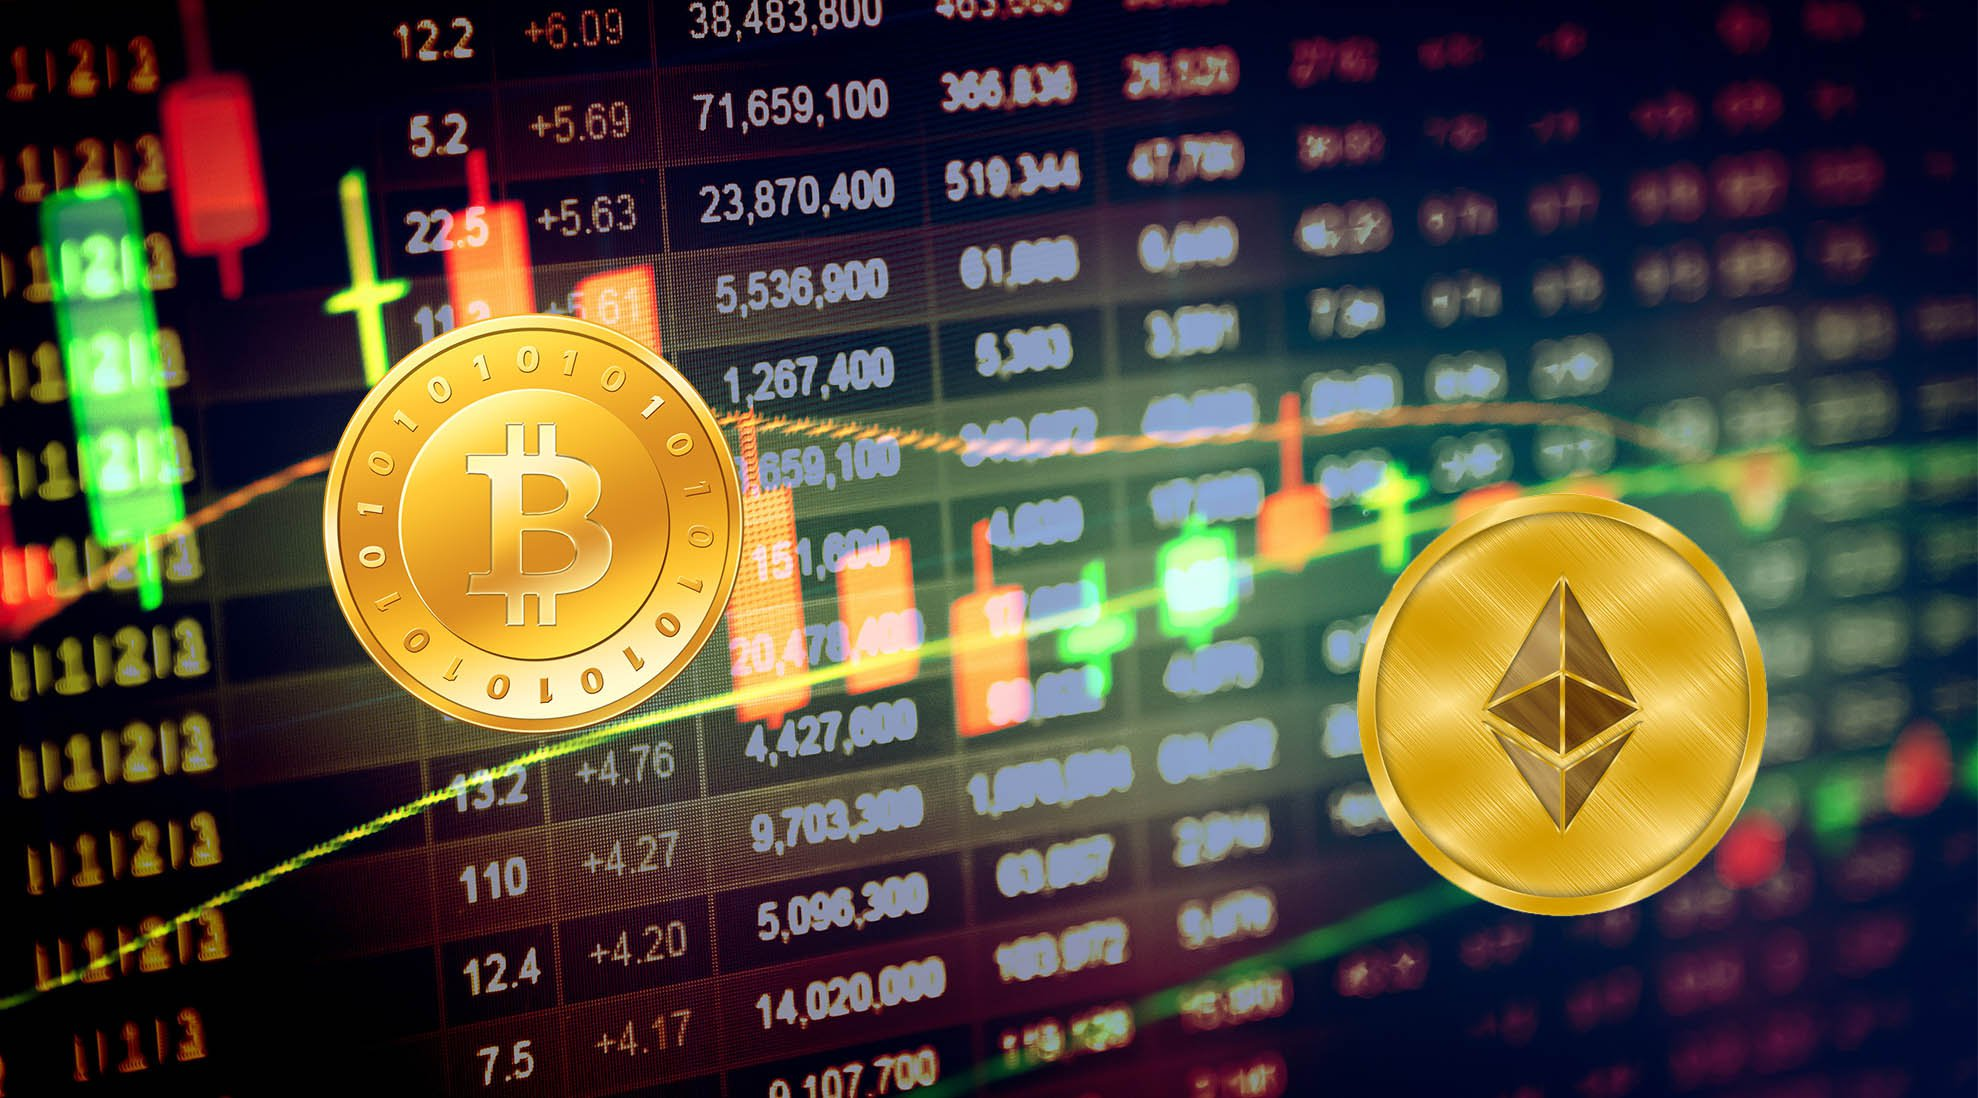 Bitcoin: BTC revisits 11,700 USD